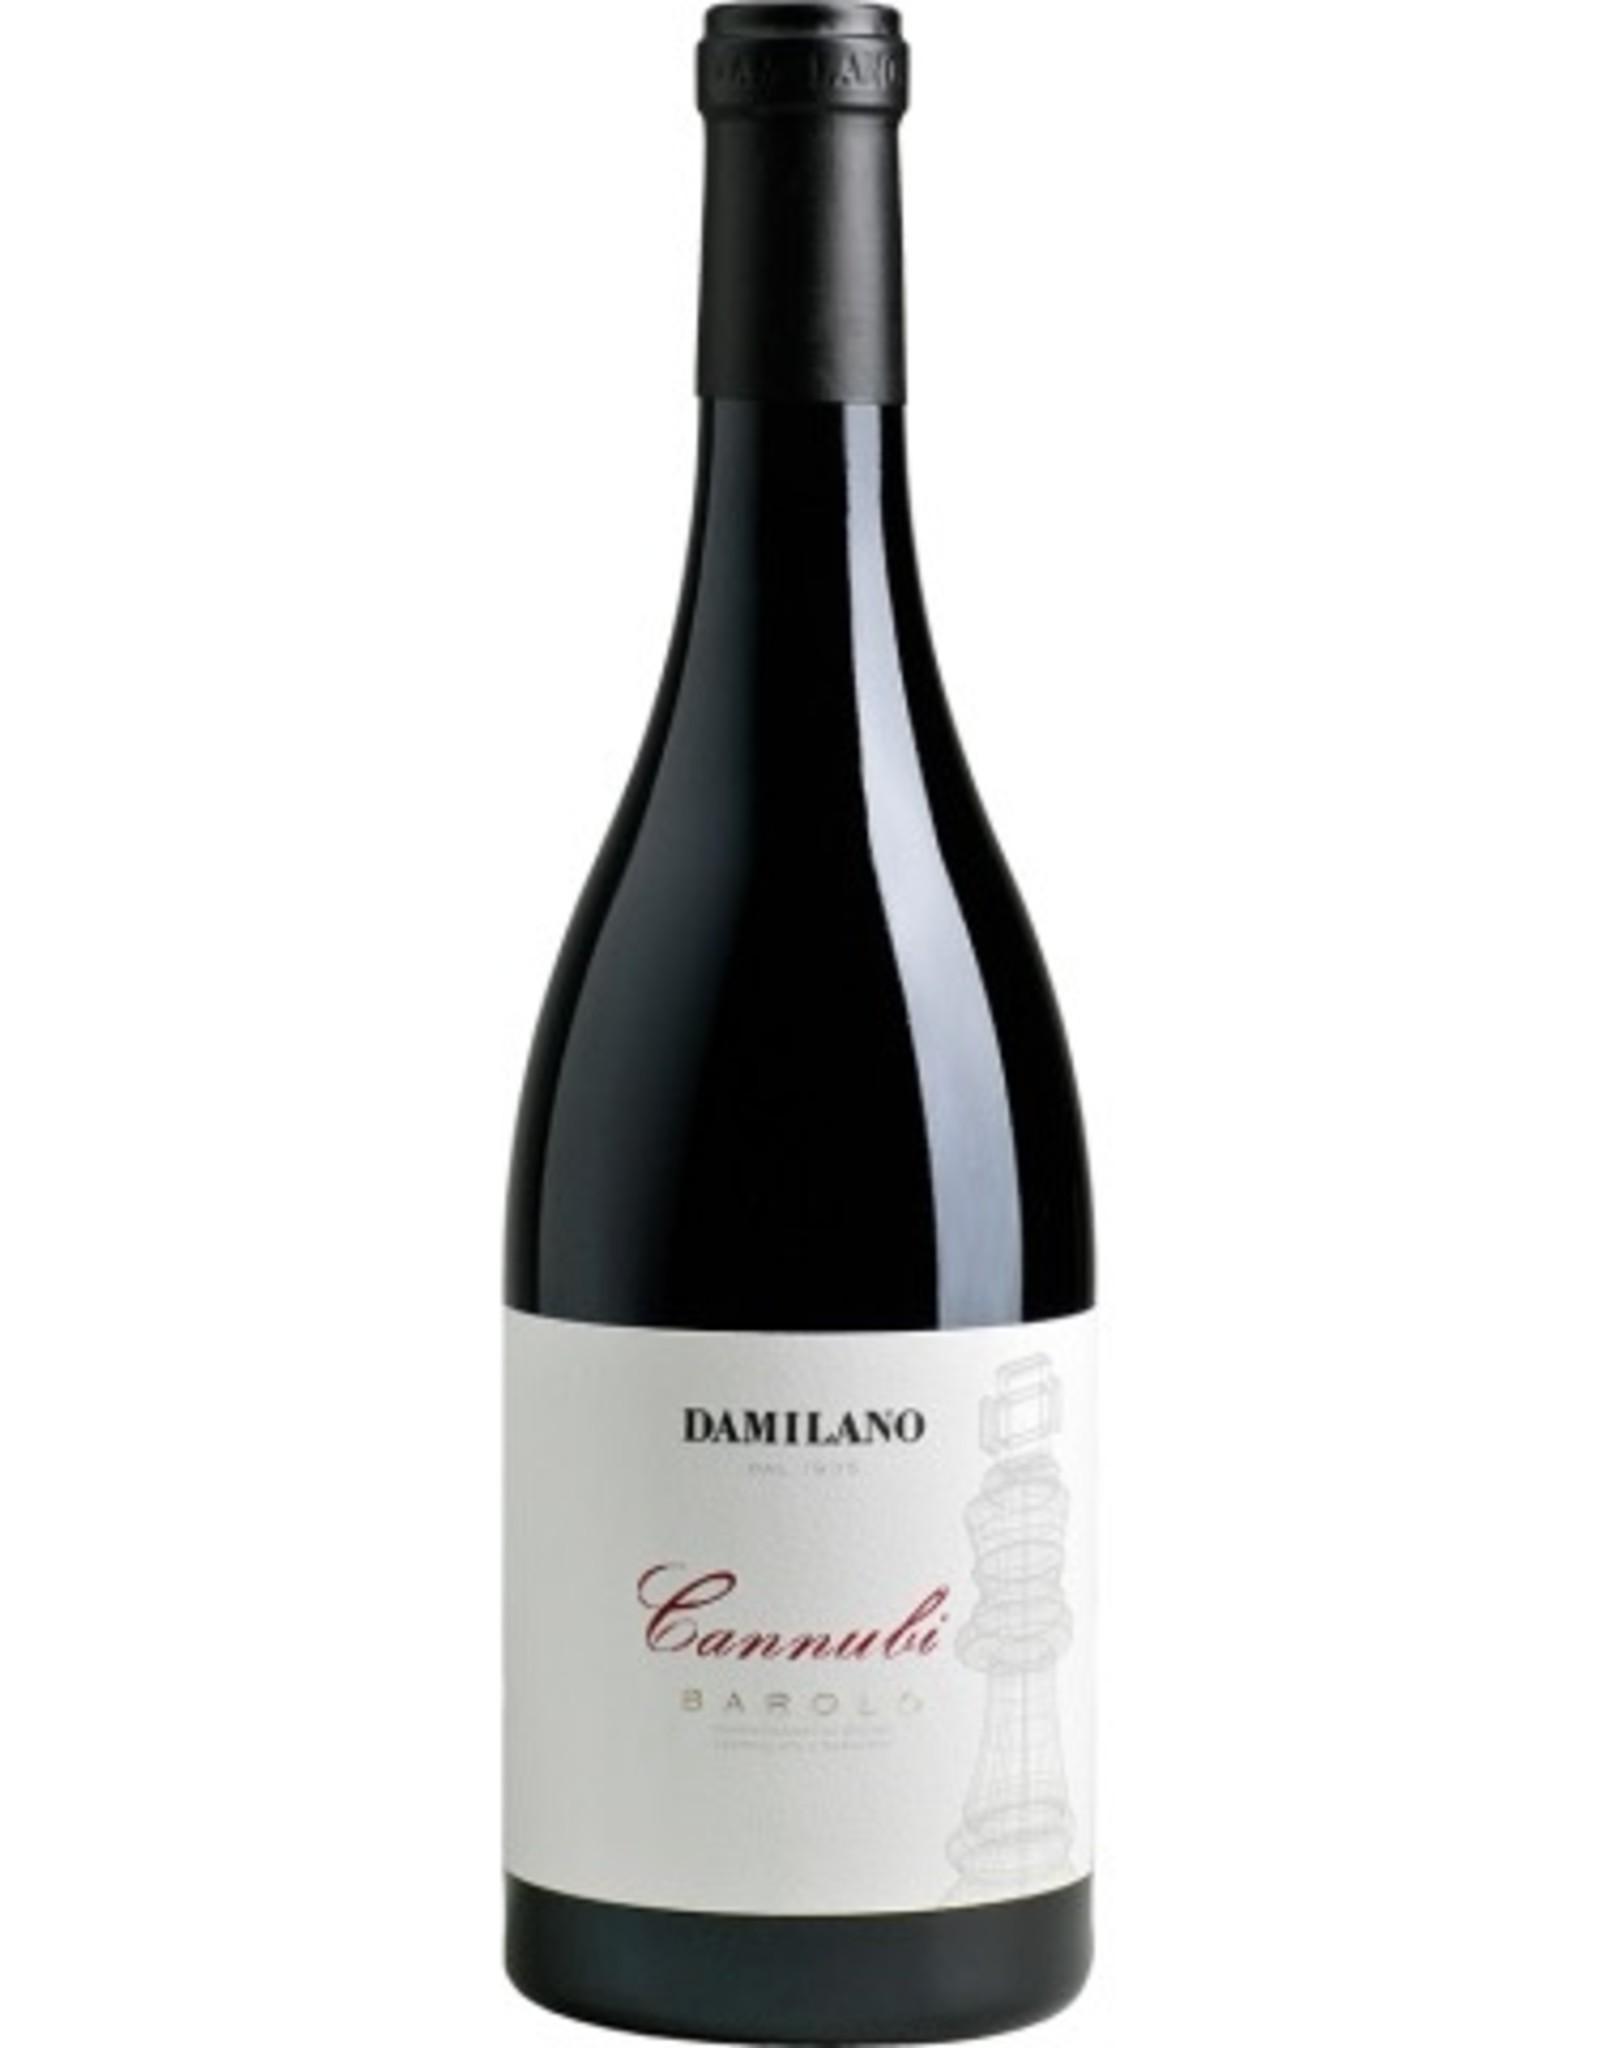 Red Wine 2012, Damilano Cannubi Vineyard, Nebbiolo, Barolo, Piemonte, Italy, 14% Alc, CT